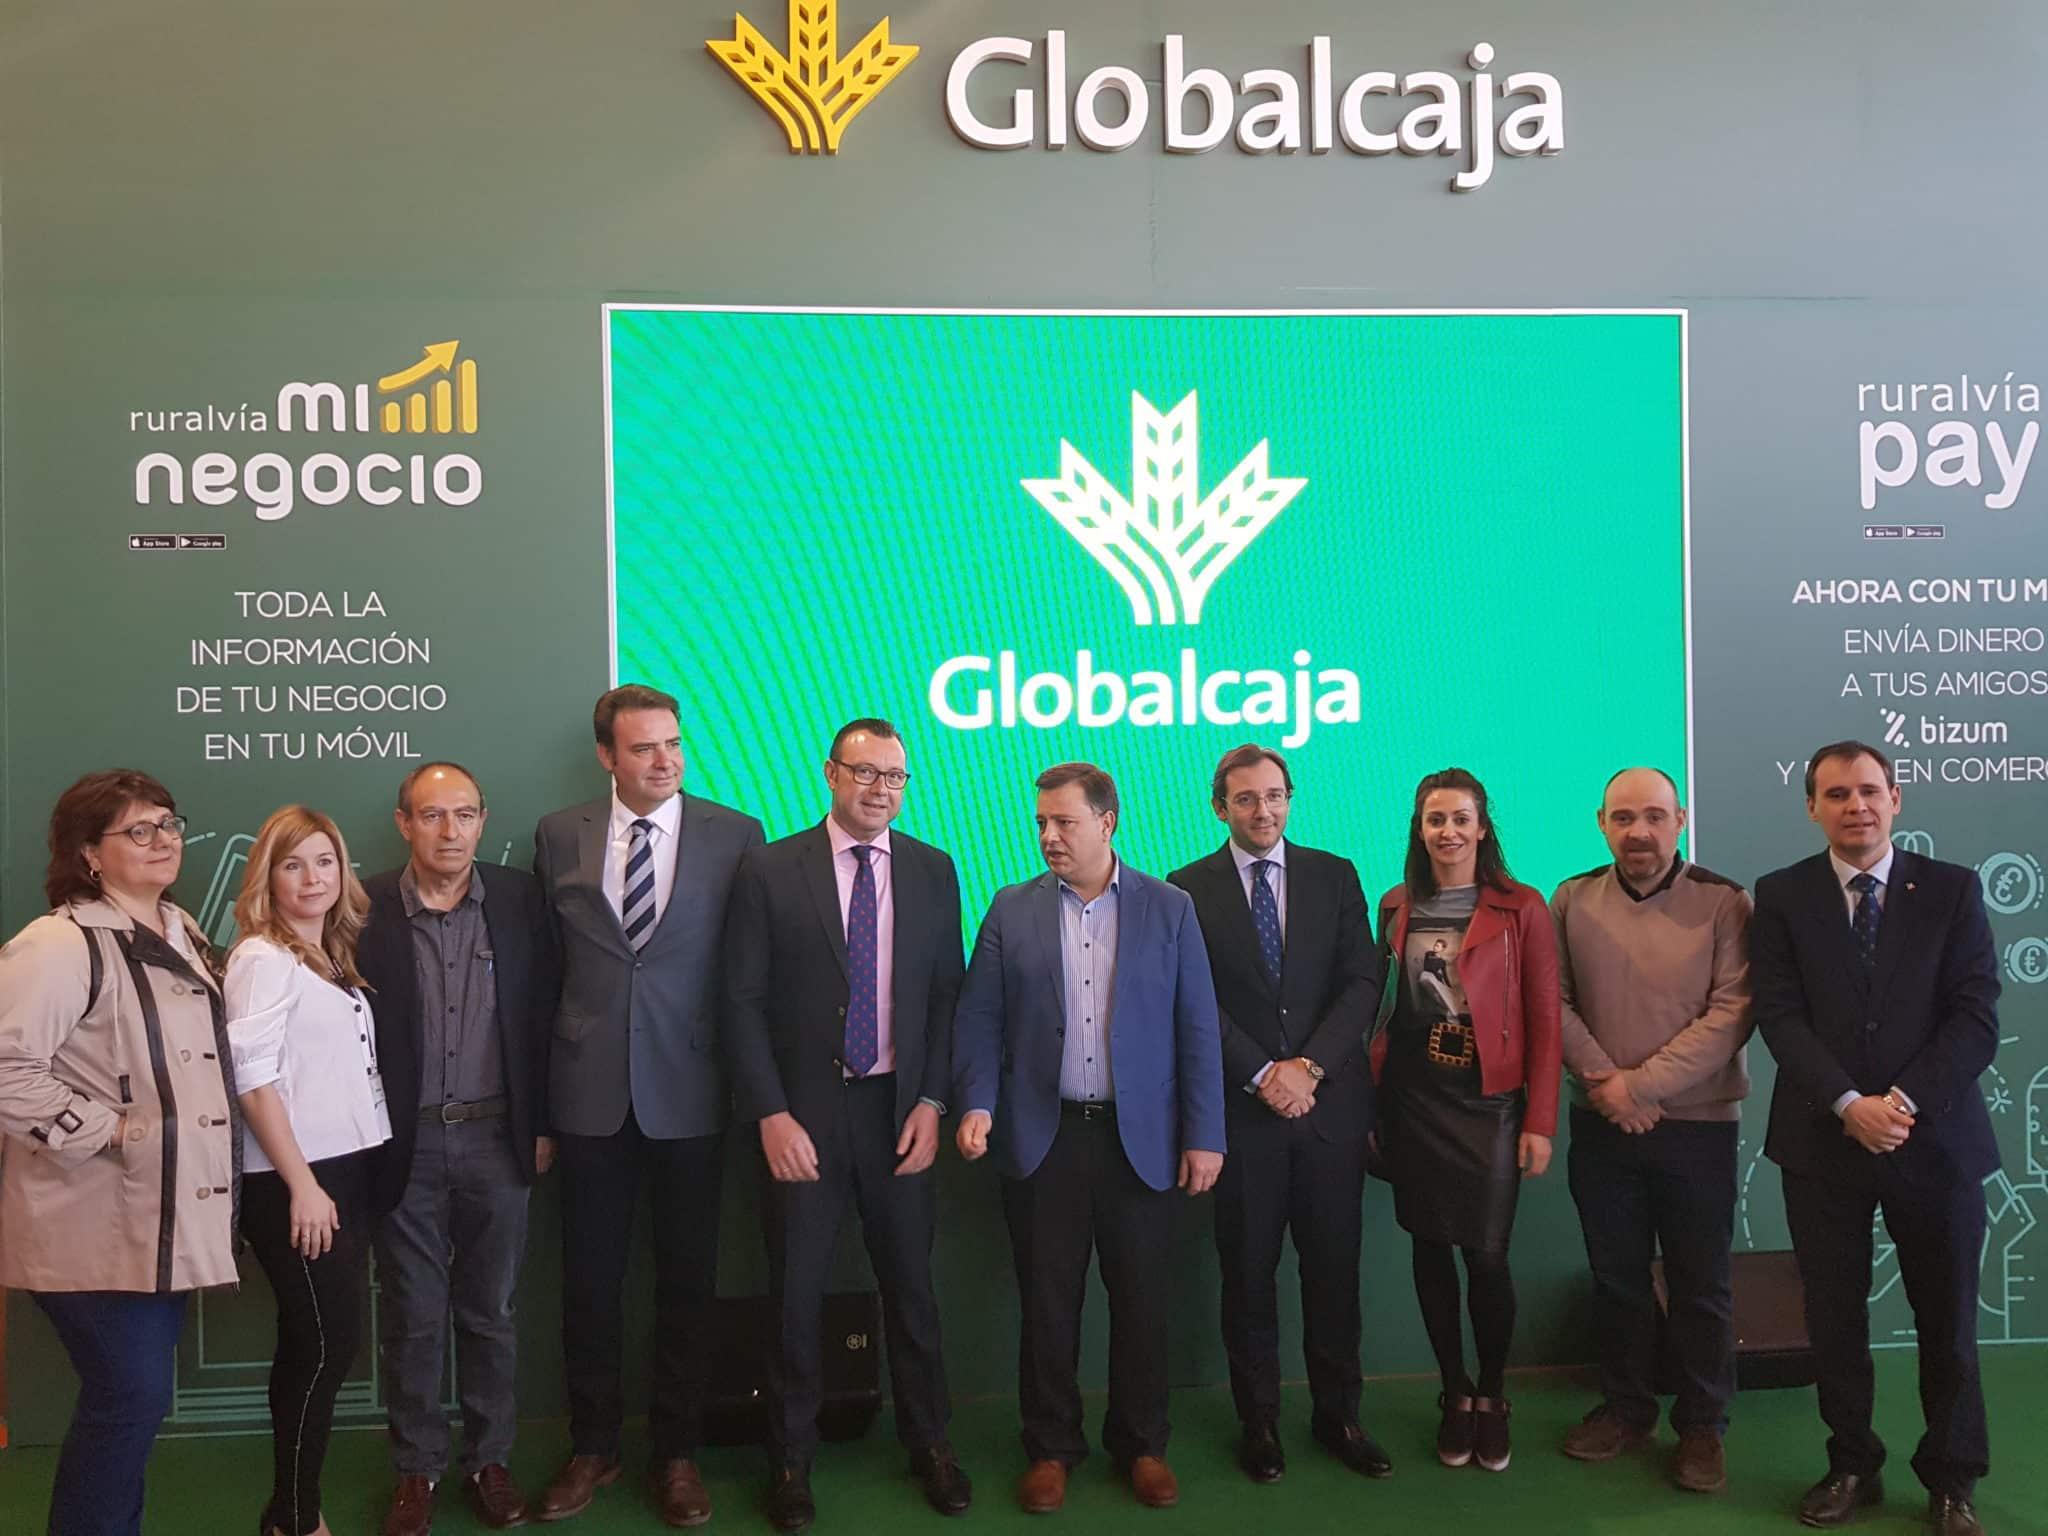 https://blog.globalcaja.es/wp-content/uploads/2019/03/Comercia-2019.jpeg